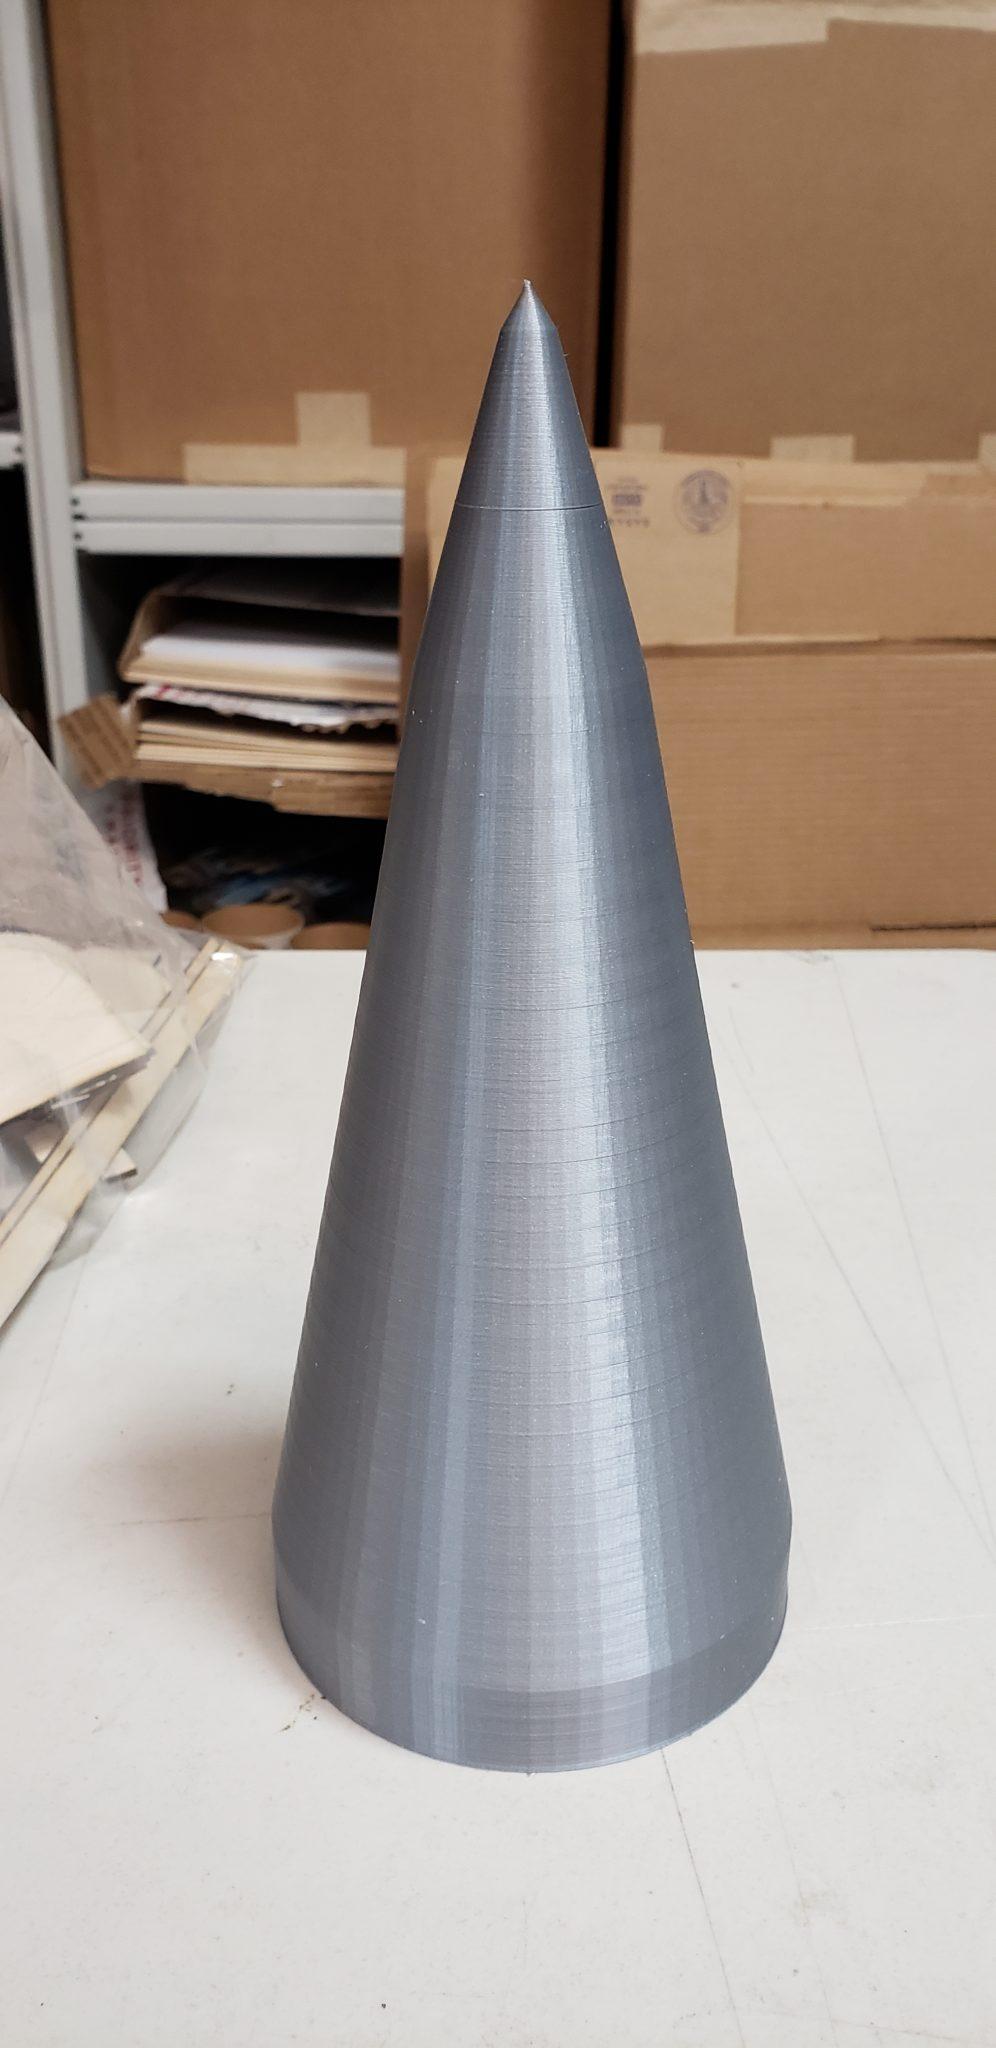 "SBR 4"" Scud Rocket Kit"